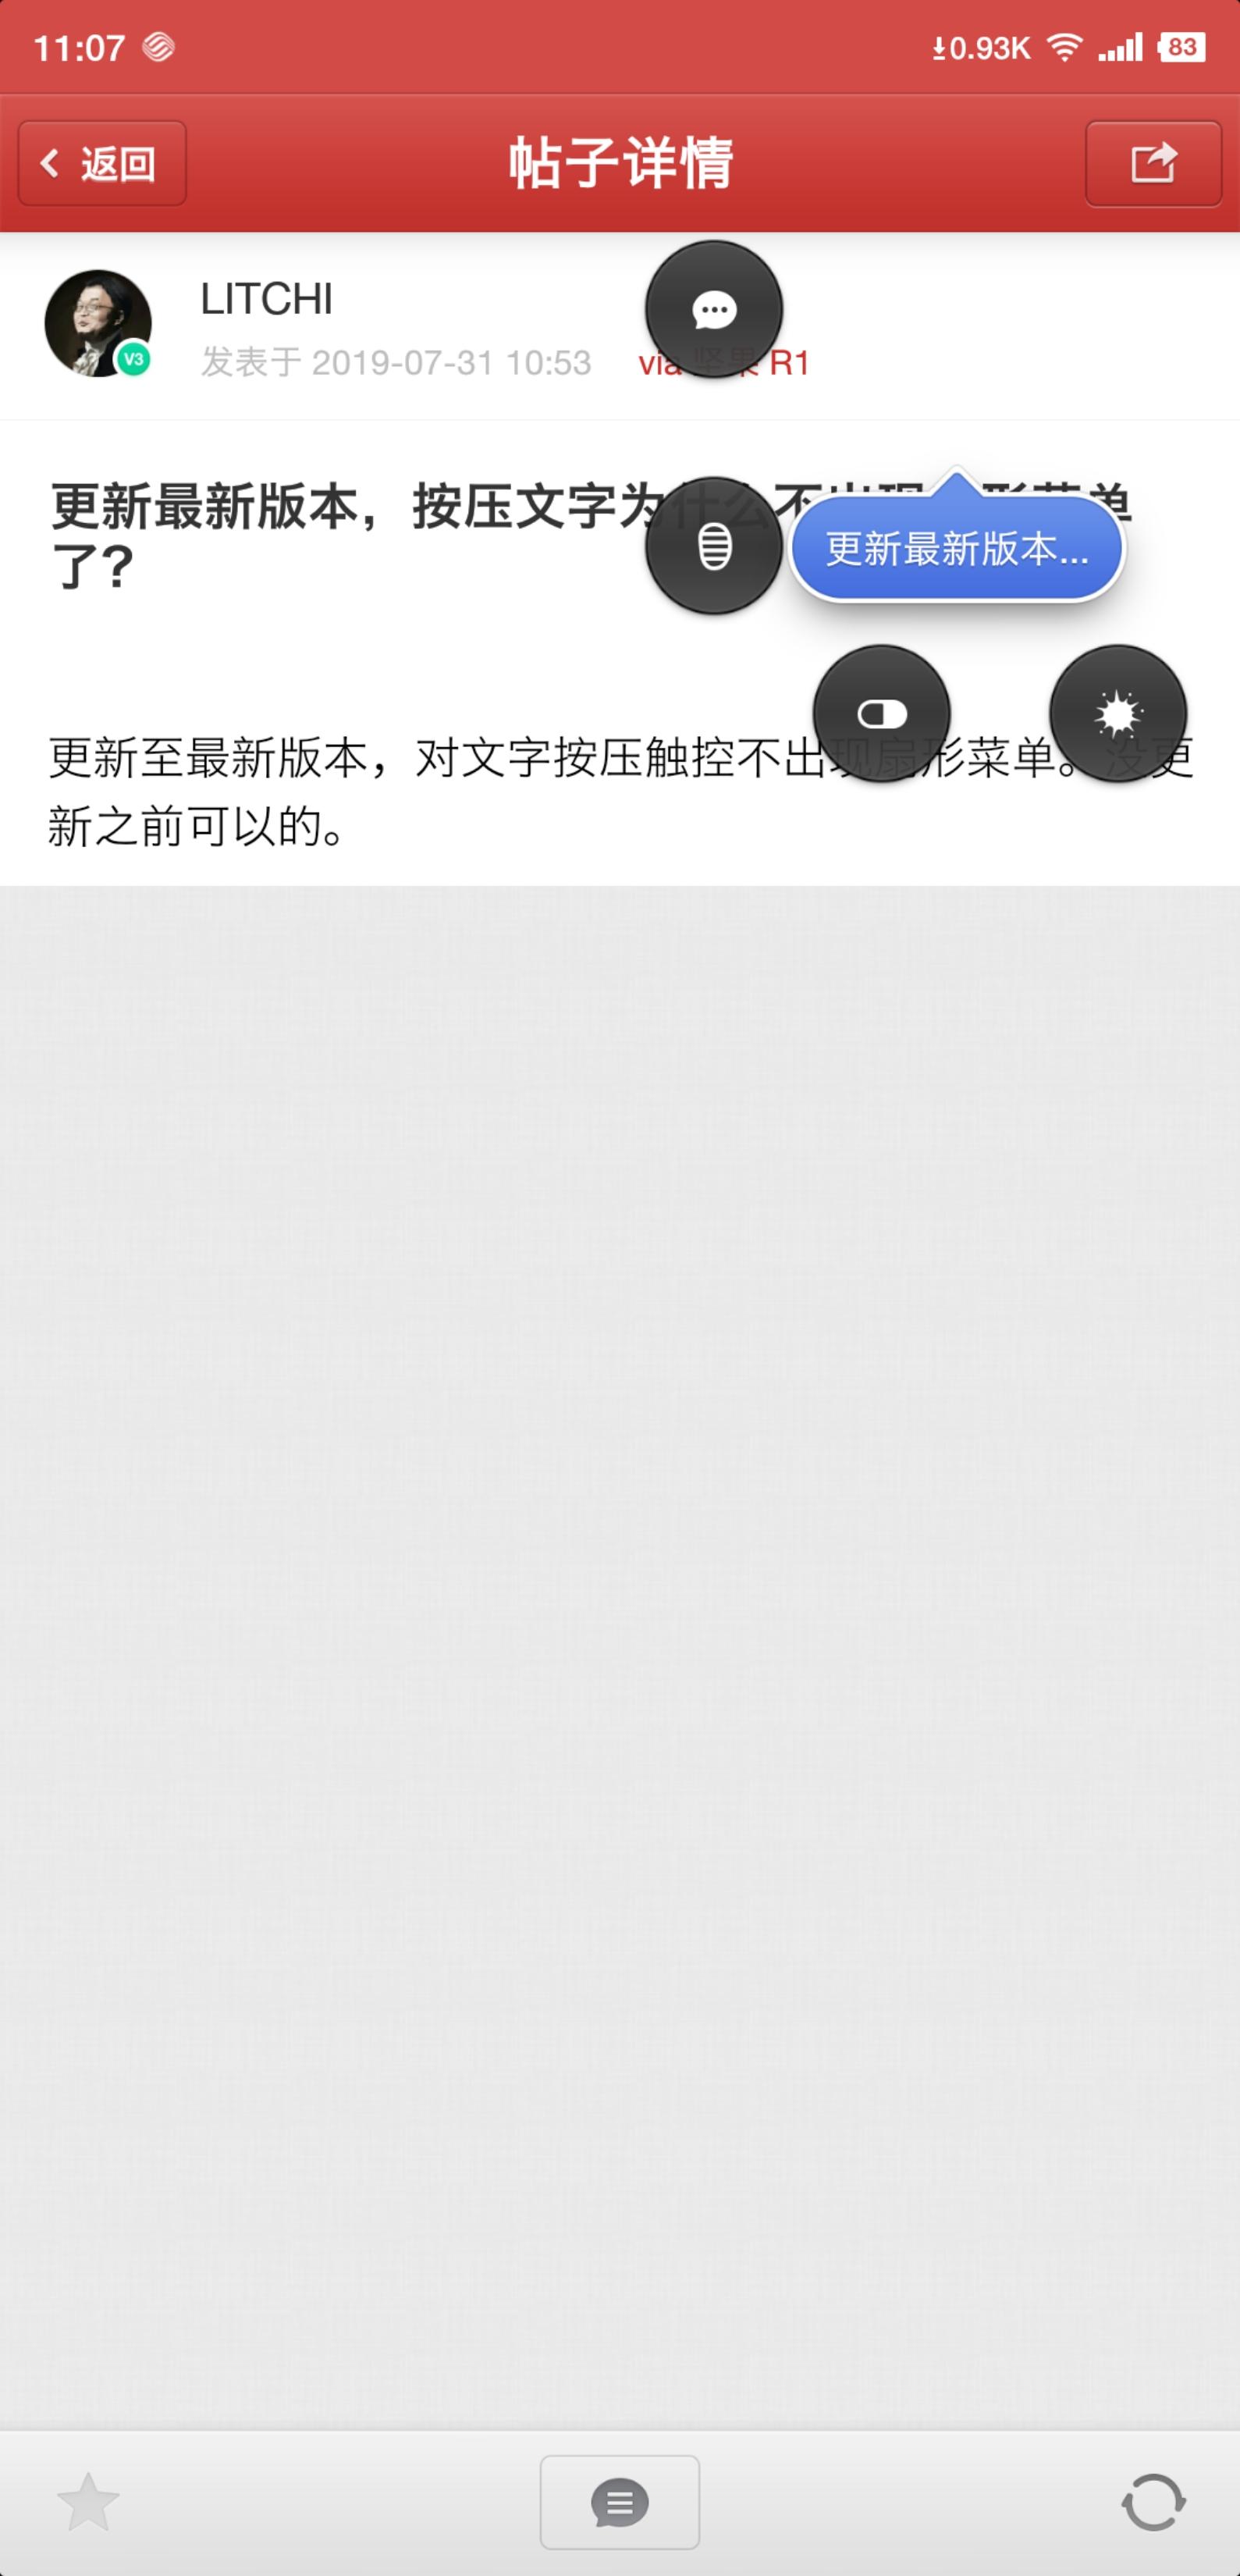 Screenshot_2019-07-31-11-07-03-963_??????.png